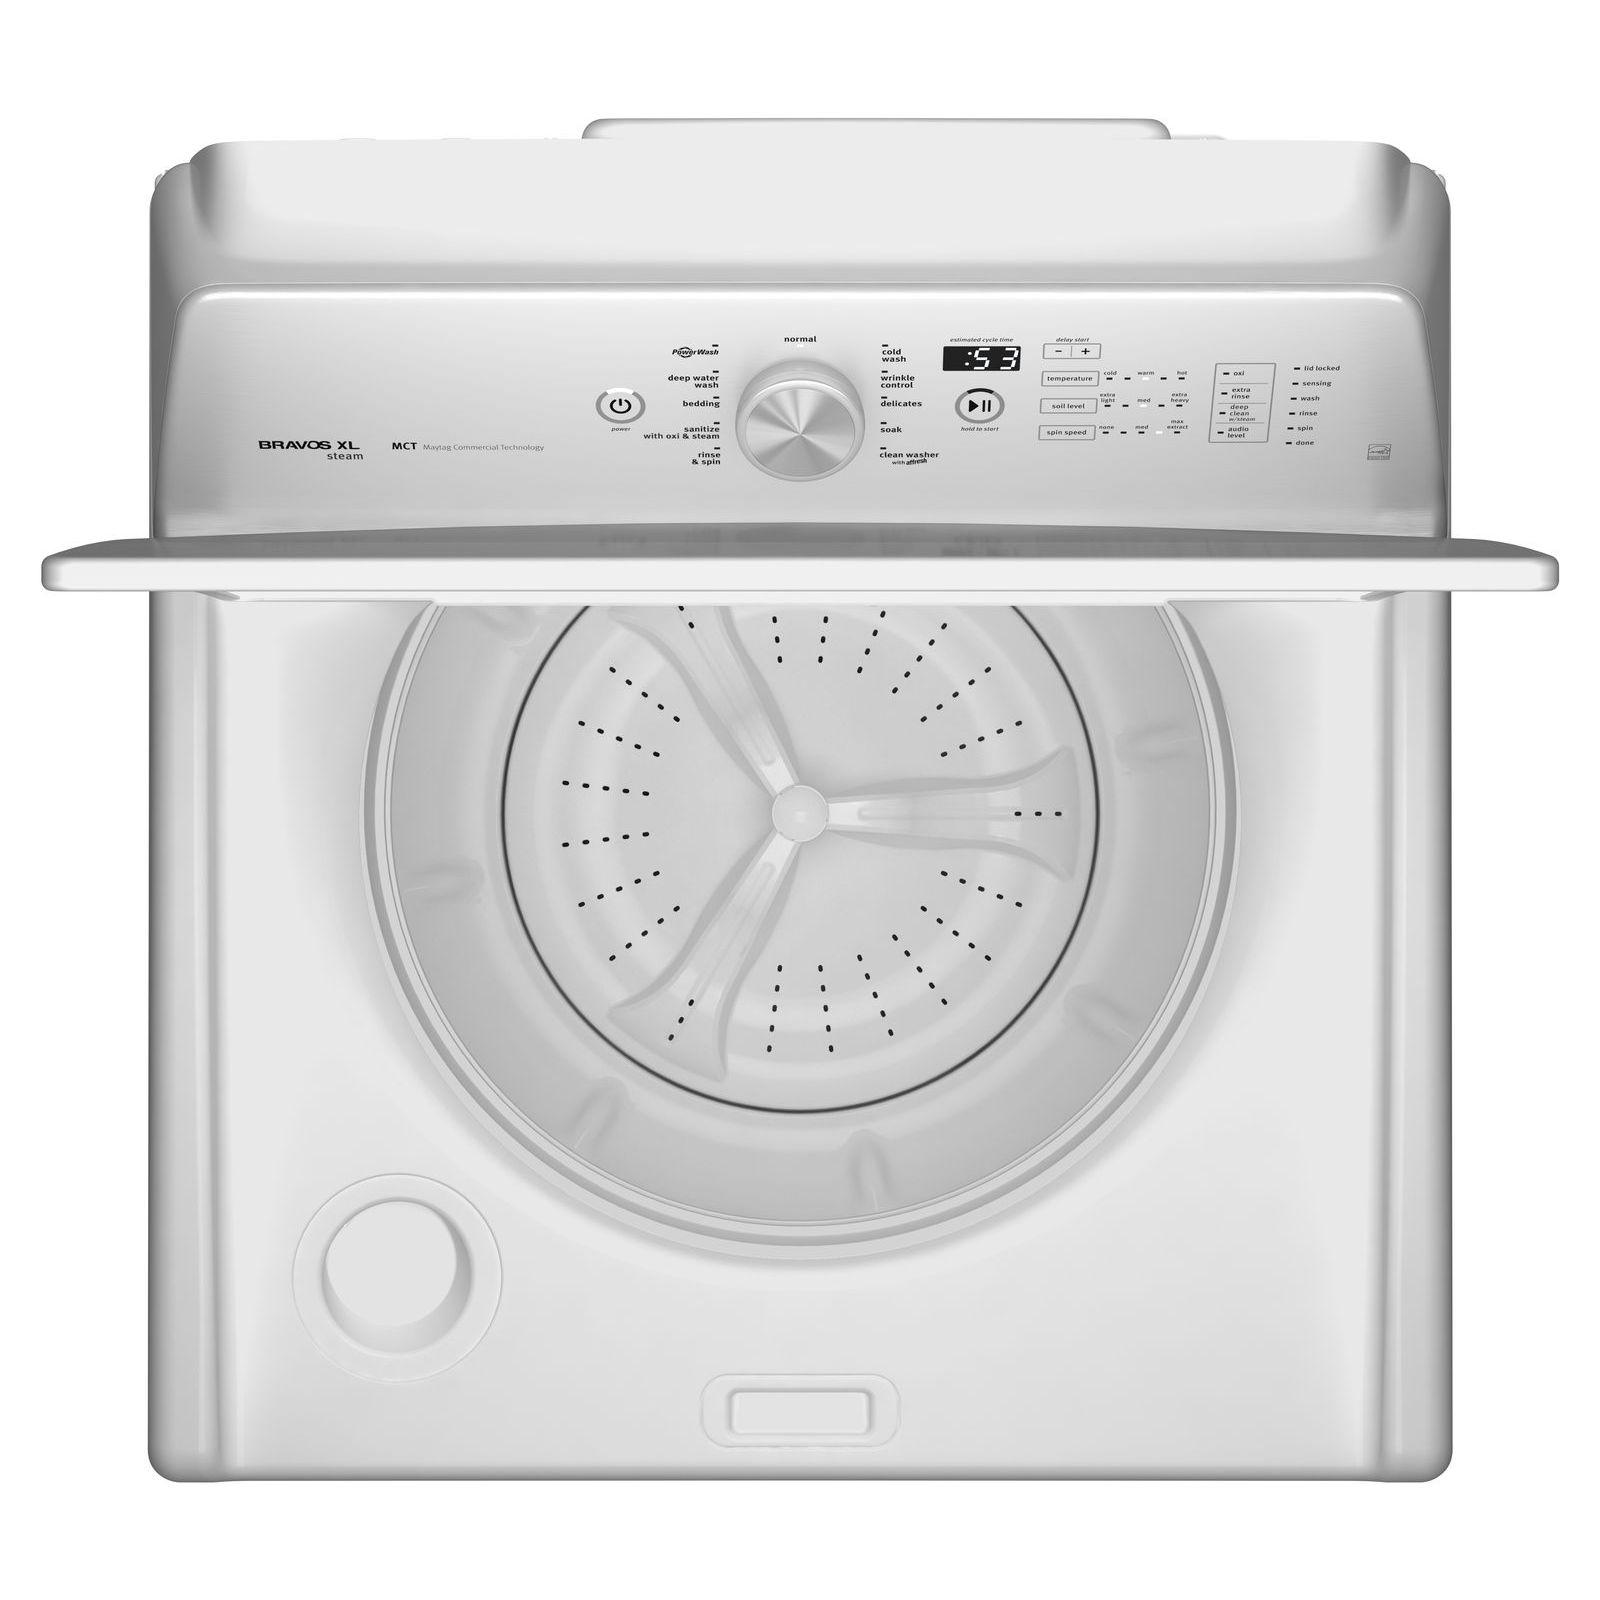 Maytag MVWB755DW 4.8 cu.ft. Top Load Washer - White